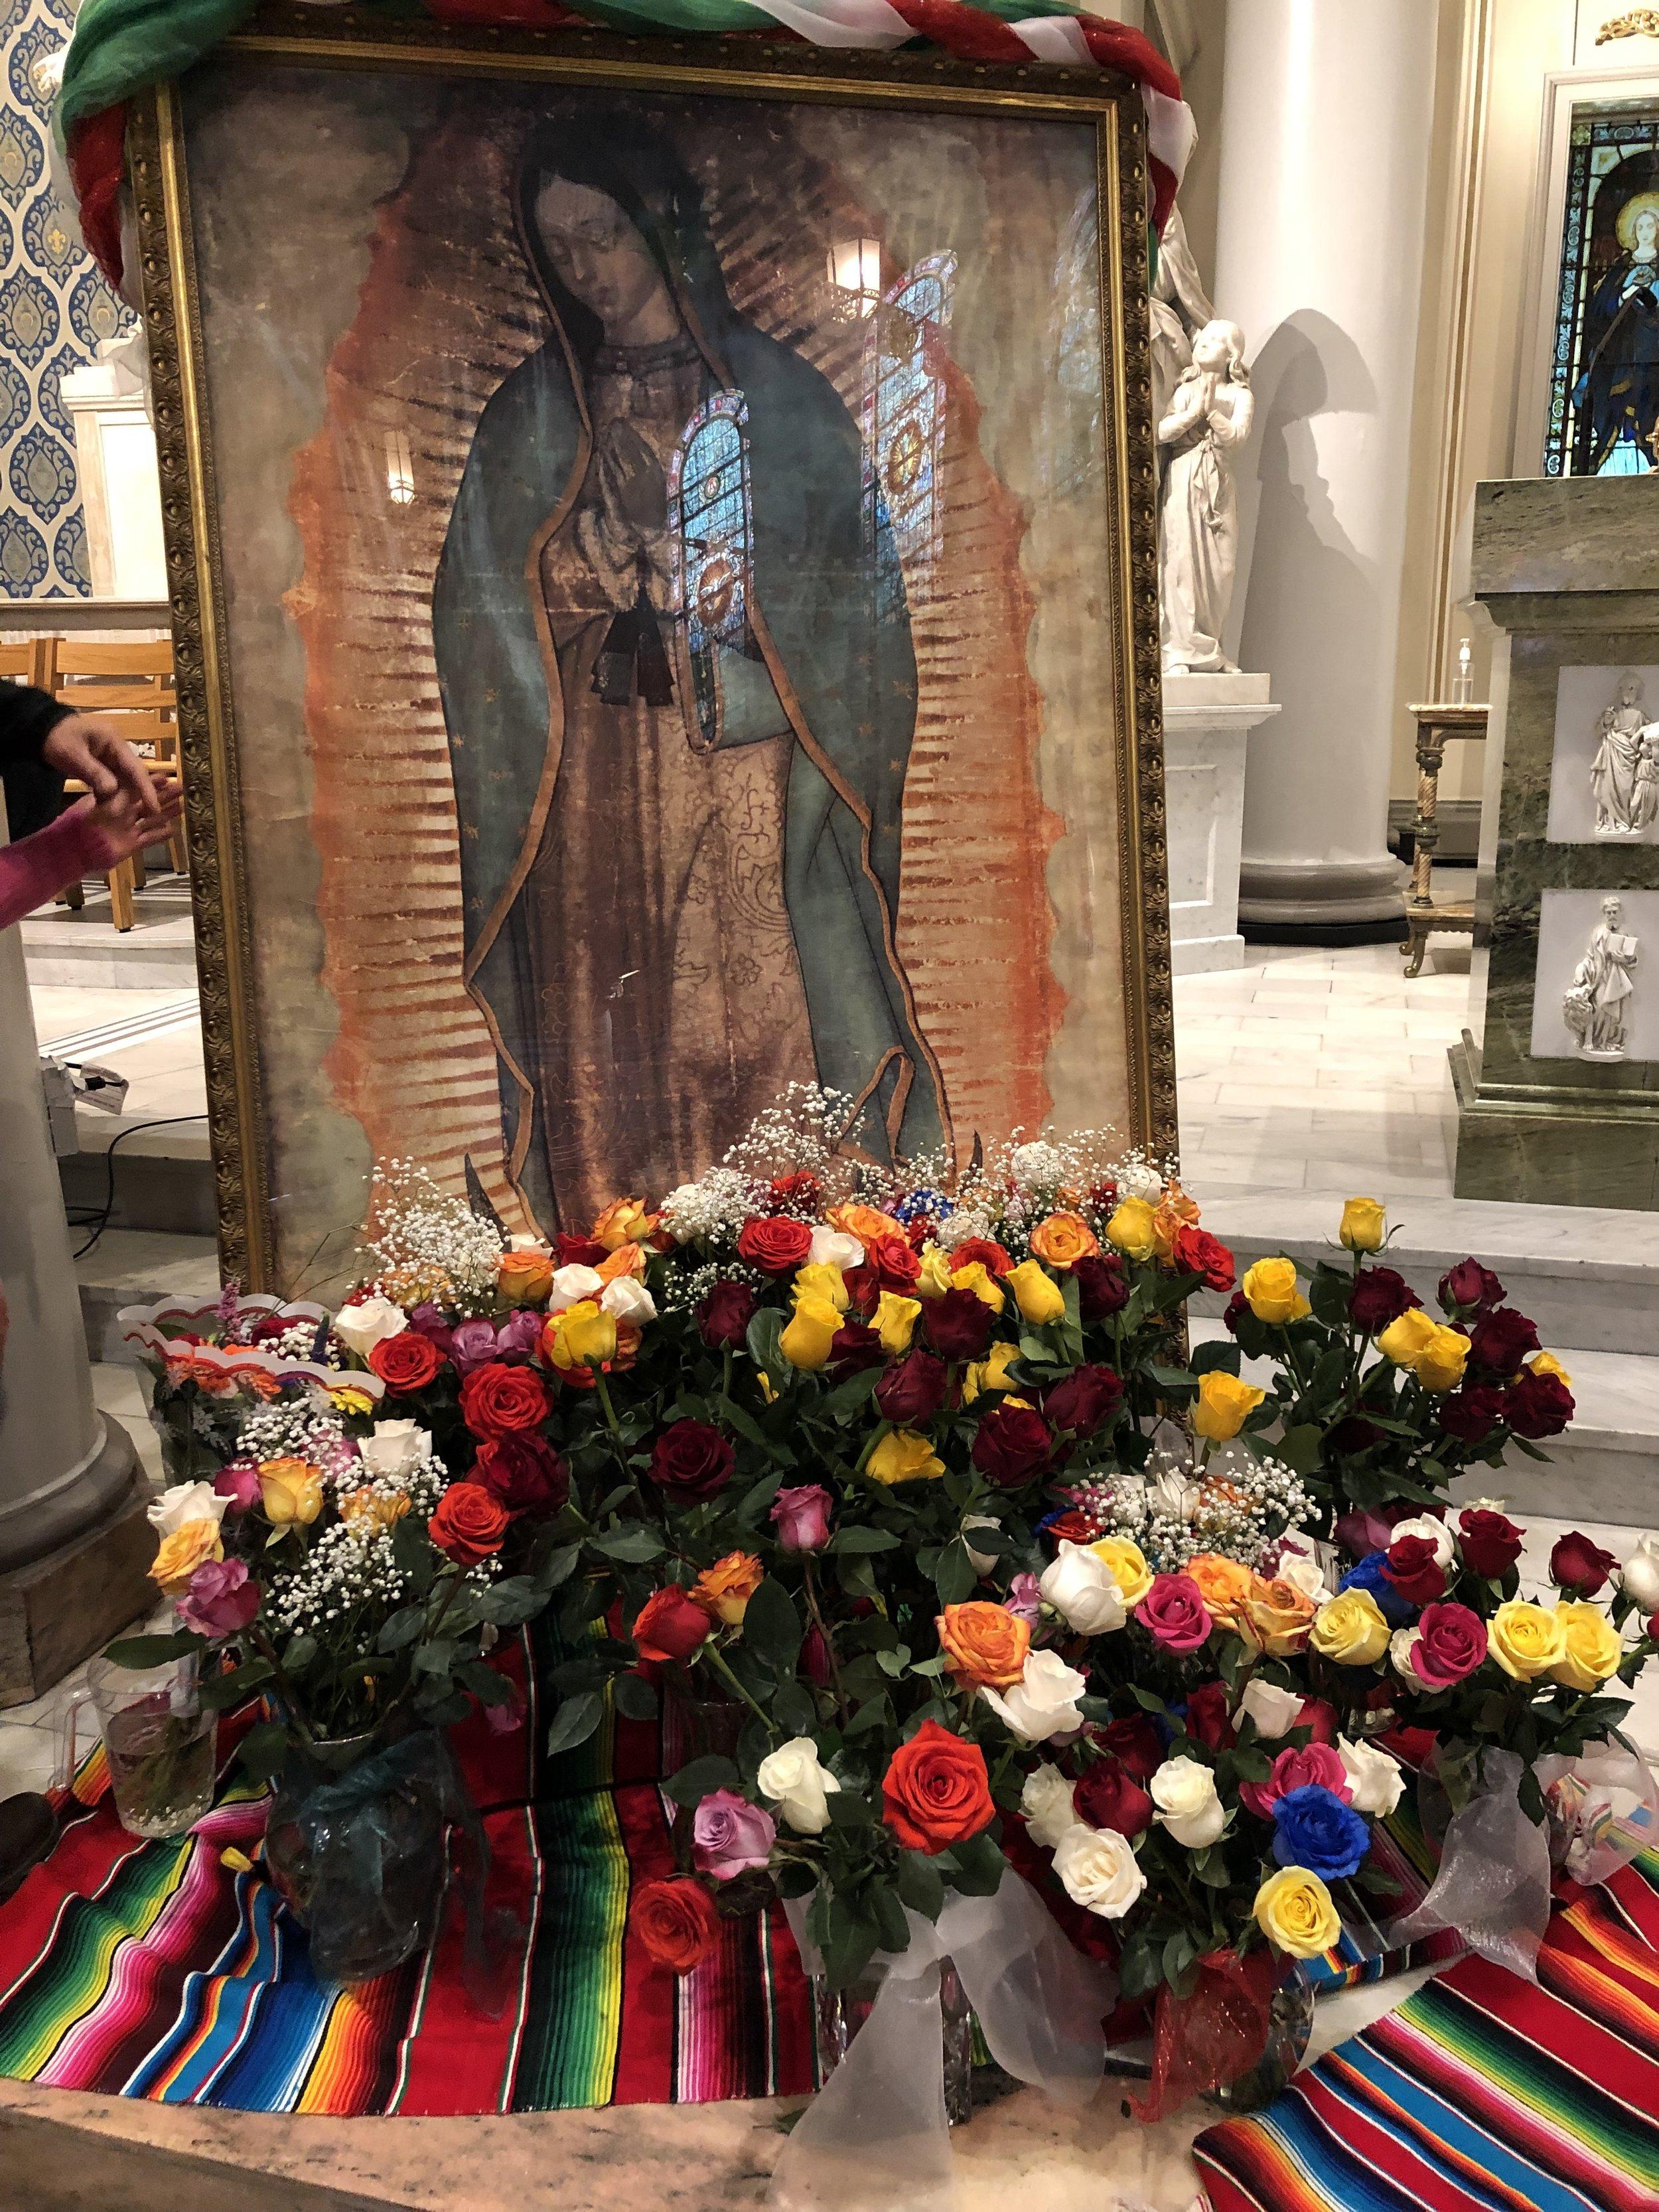 December 9, 2018—St. Francis de Sales' parish celebration of Our Lady of Guadalupe